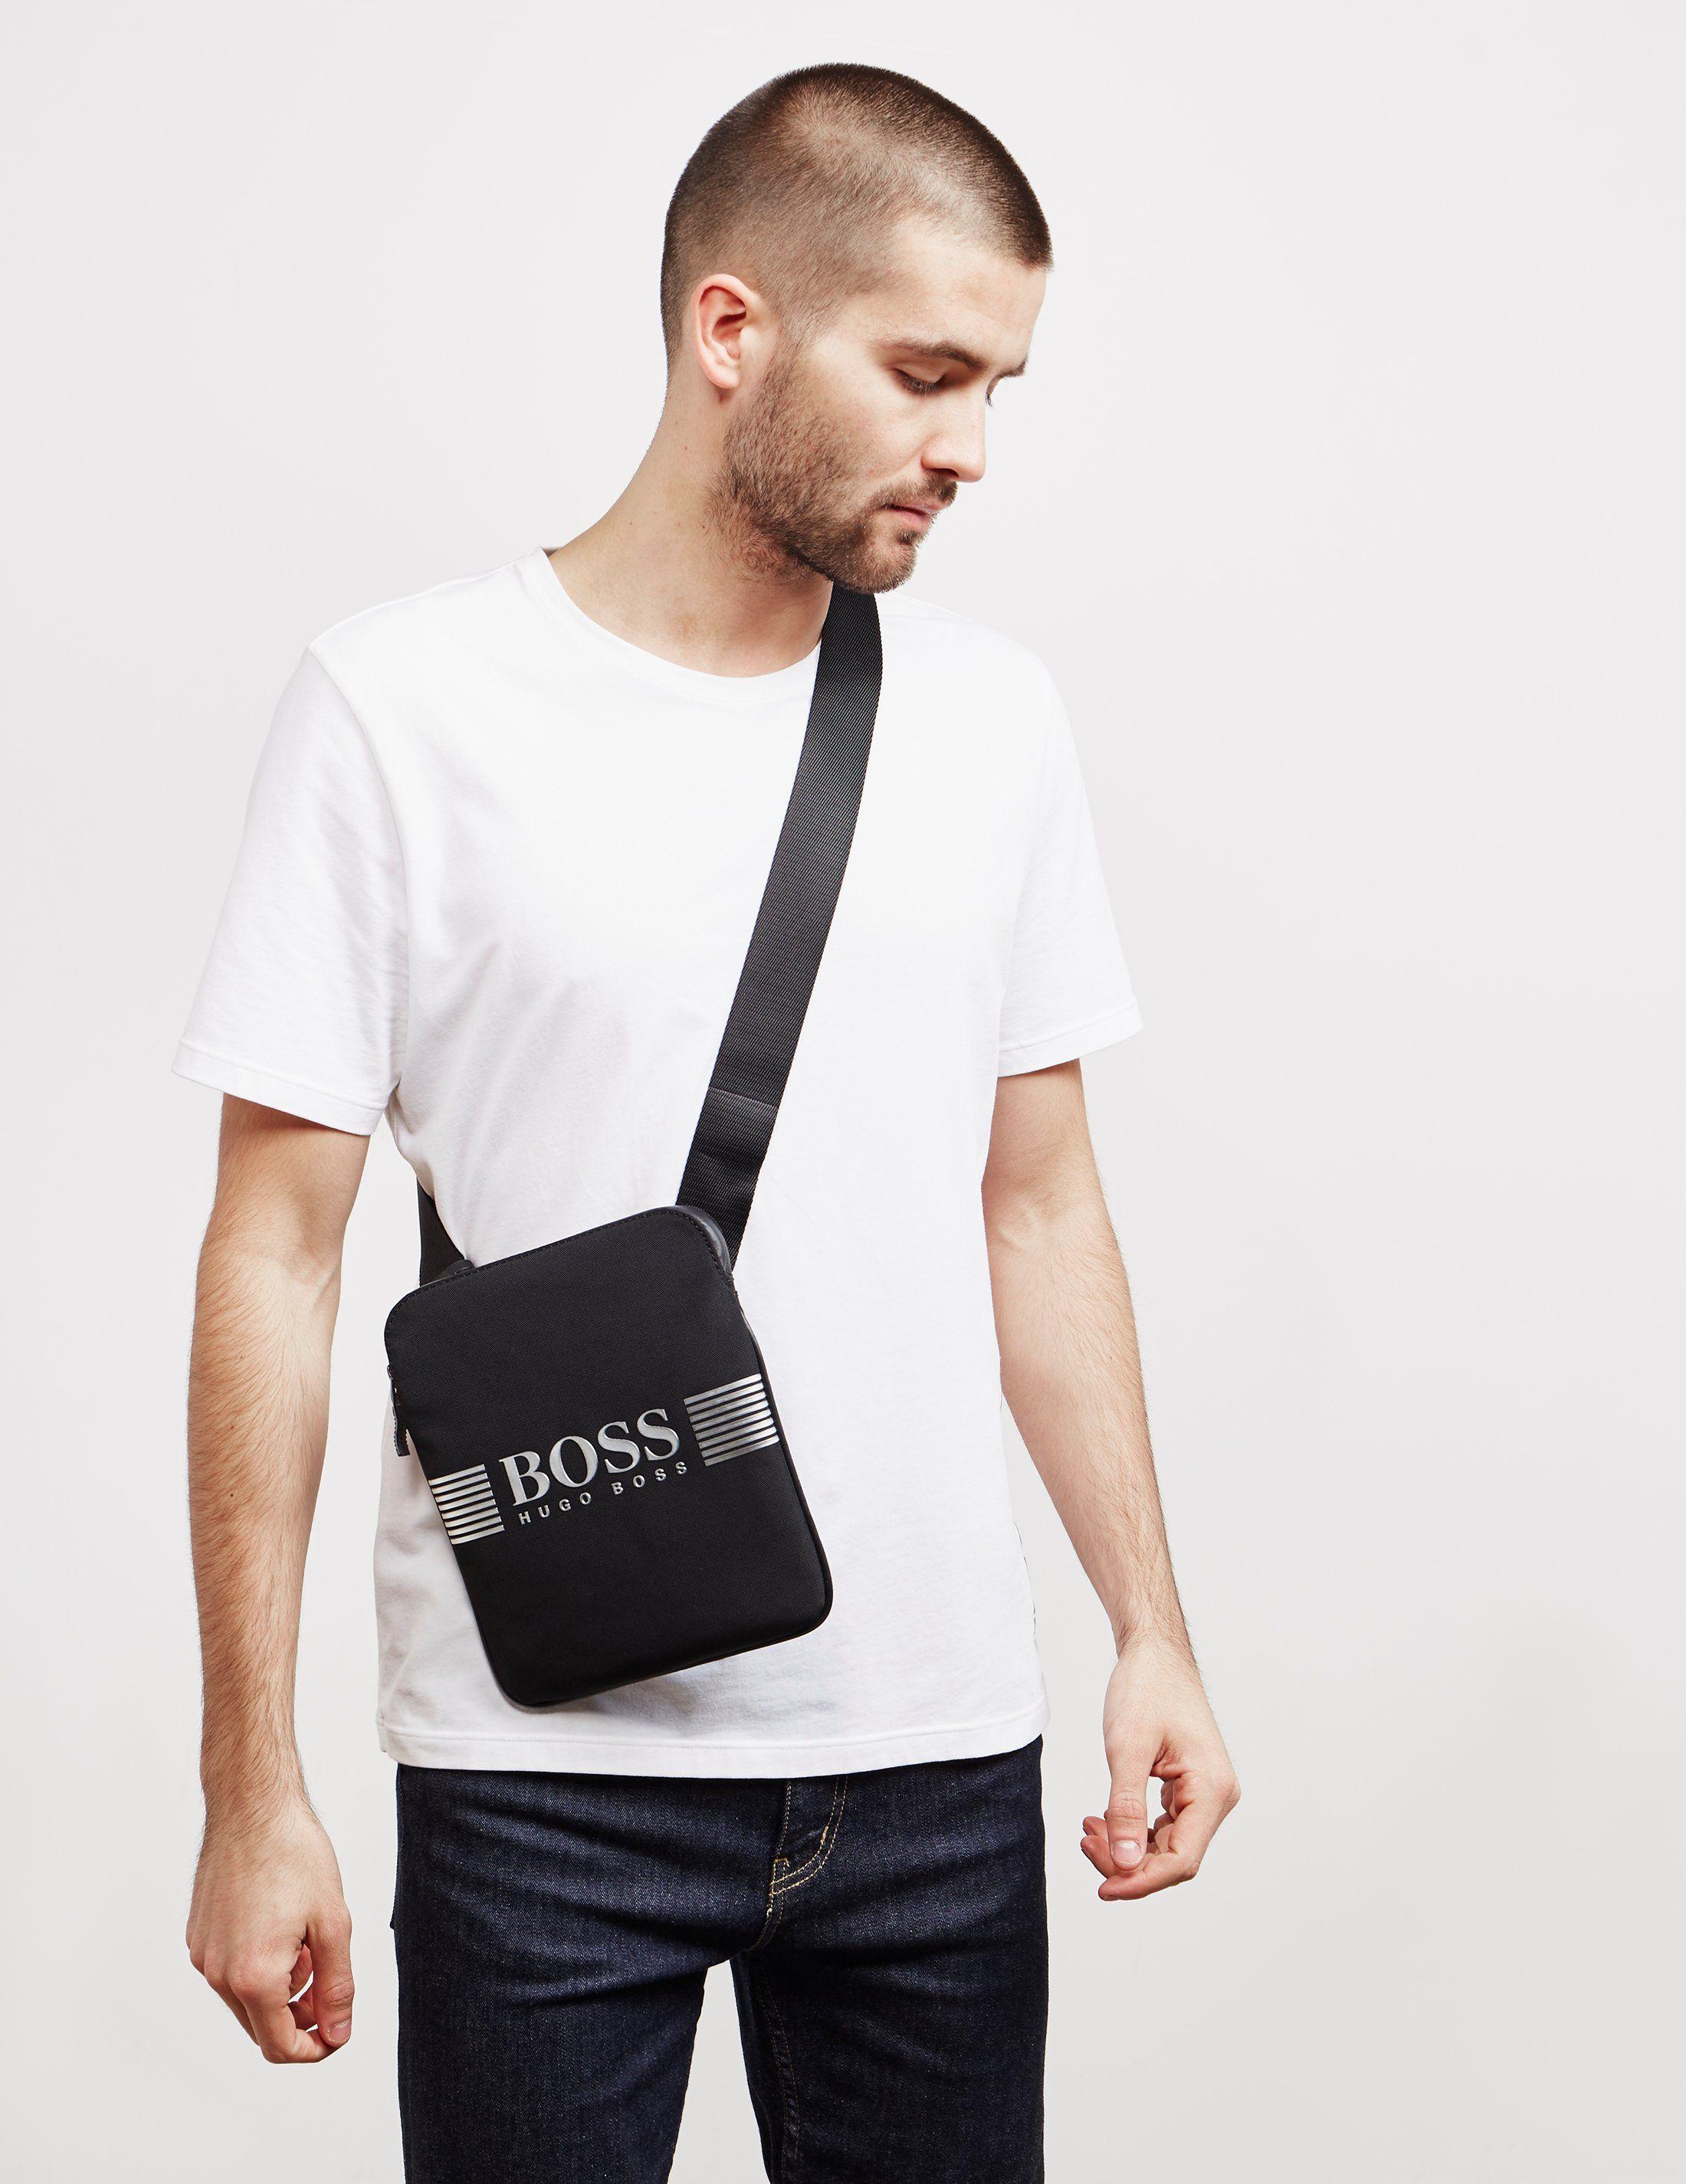 BOSS Pixel Small Item Pouch Bag